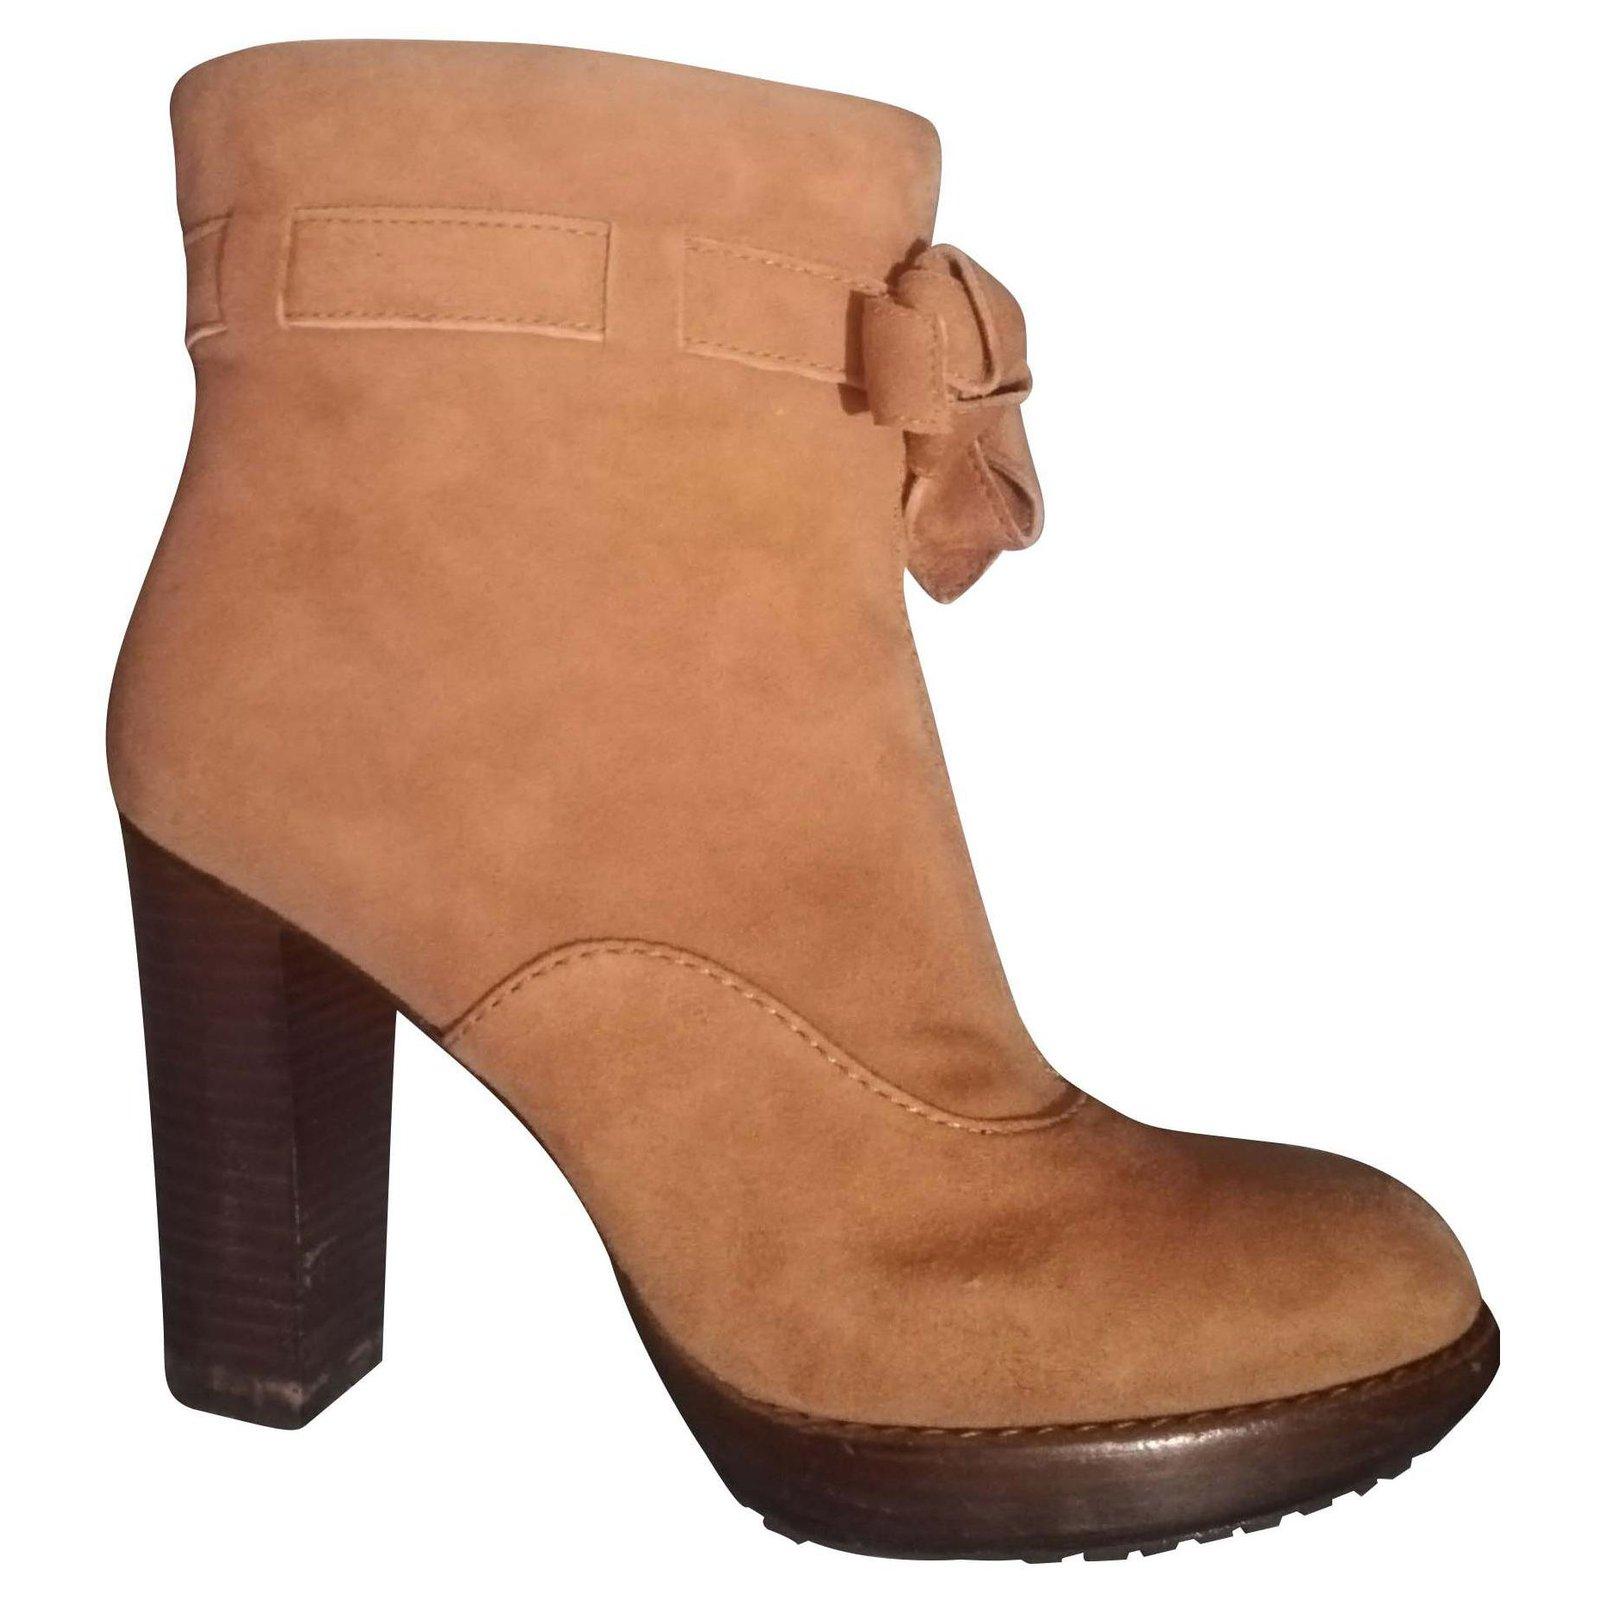 Paul Smith Paul Smith Liberty boots